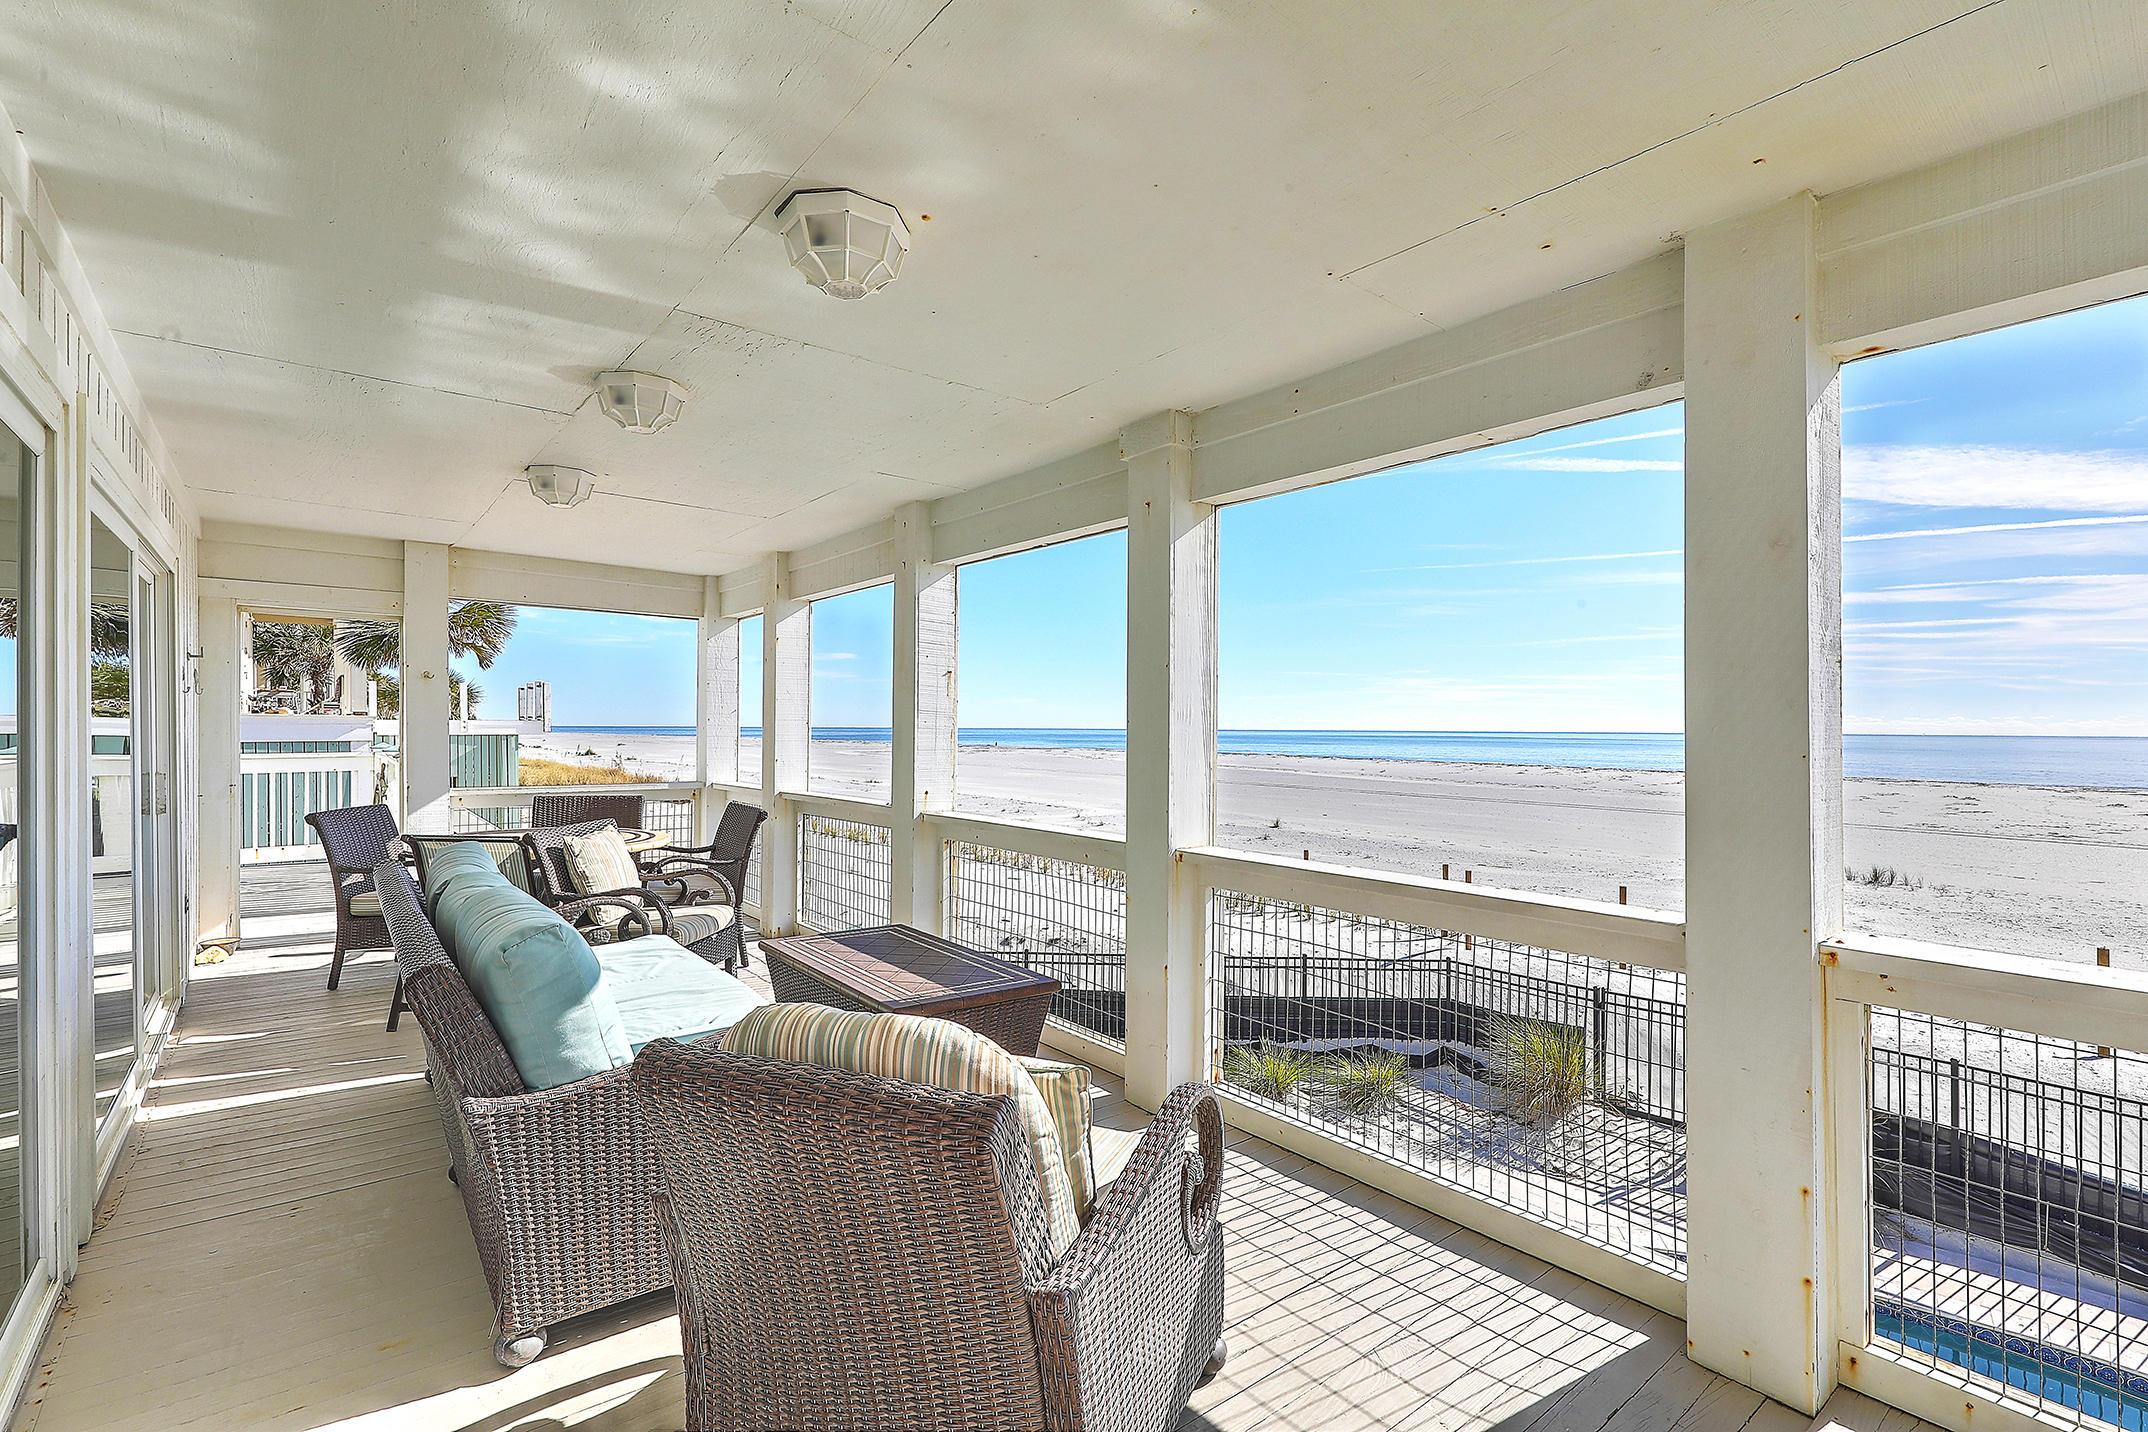 Wild Dunes Homes For Sale - 14 Beachwood East, Isle of Palms, SC - 24